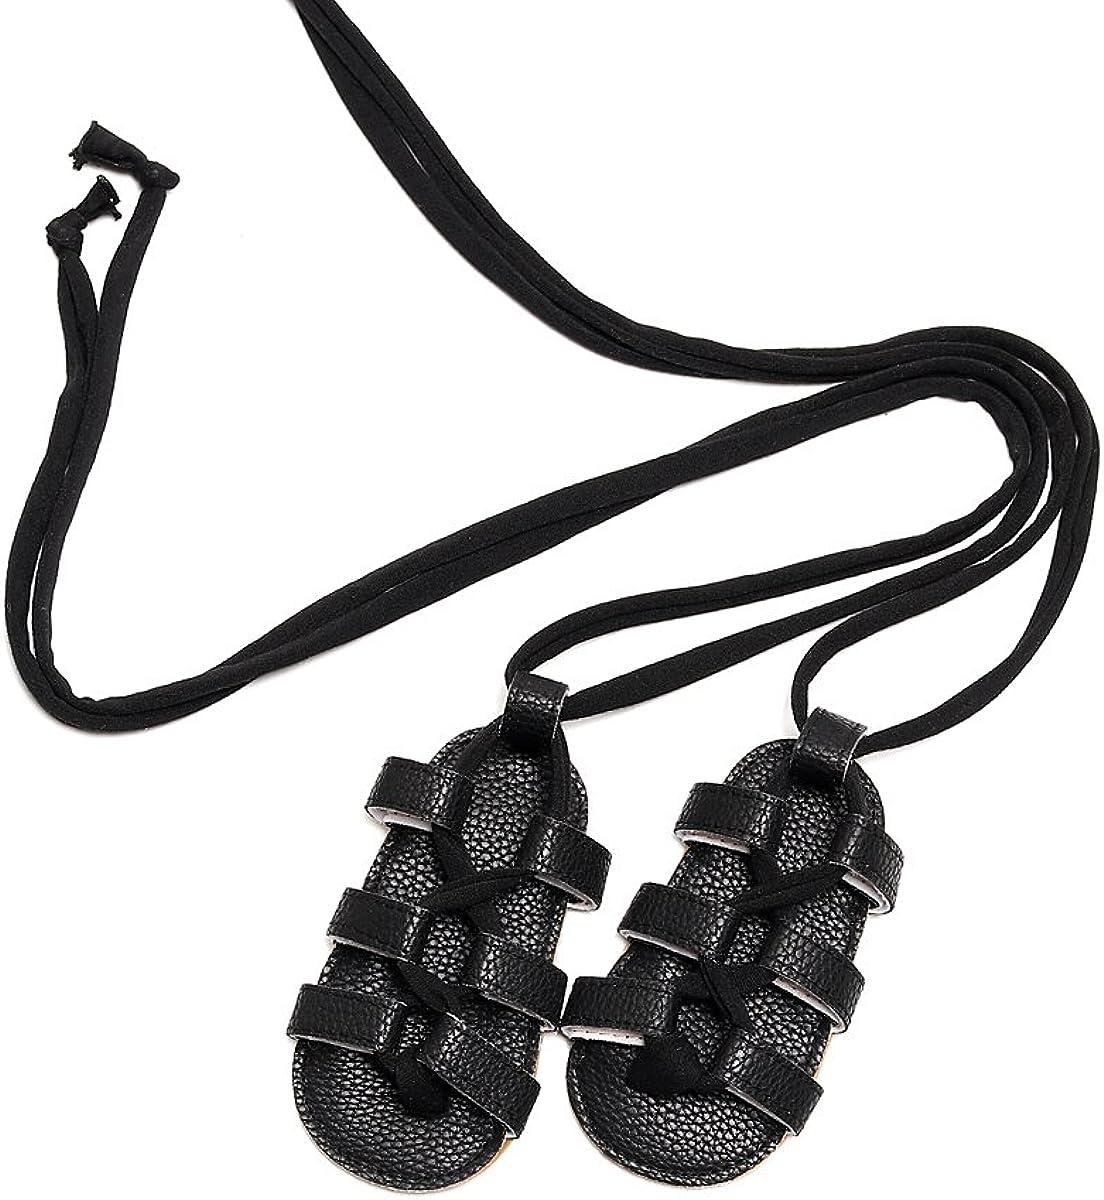 HONGTEYA Infant Toddler Baby Girl Summer Shoes Rubber Sole PU Leather Prewalker Newborn Gladiator Sandals